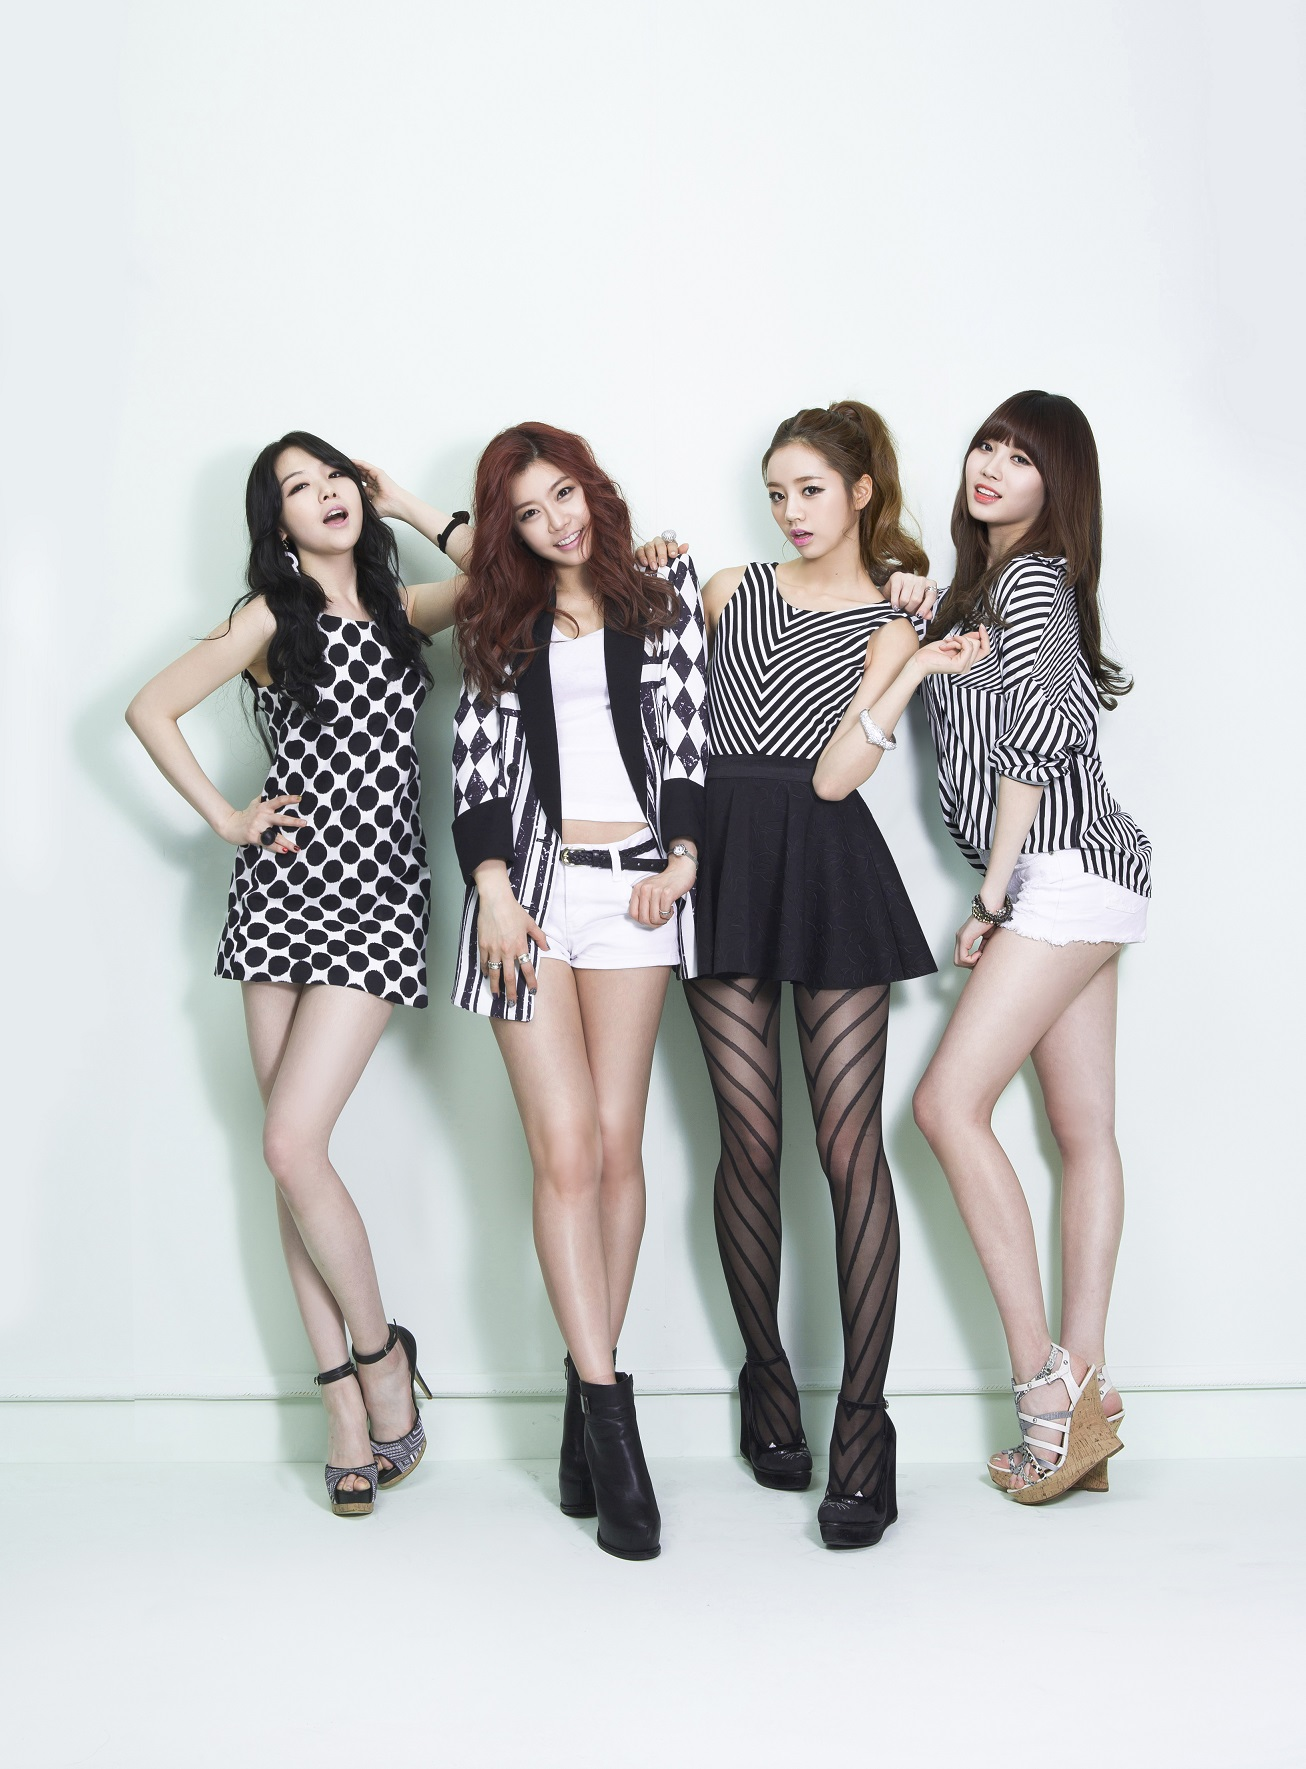 GirlsDay_2013090716451959c.jpg